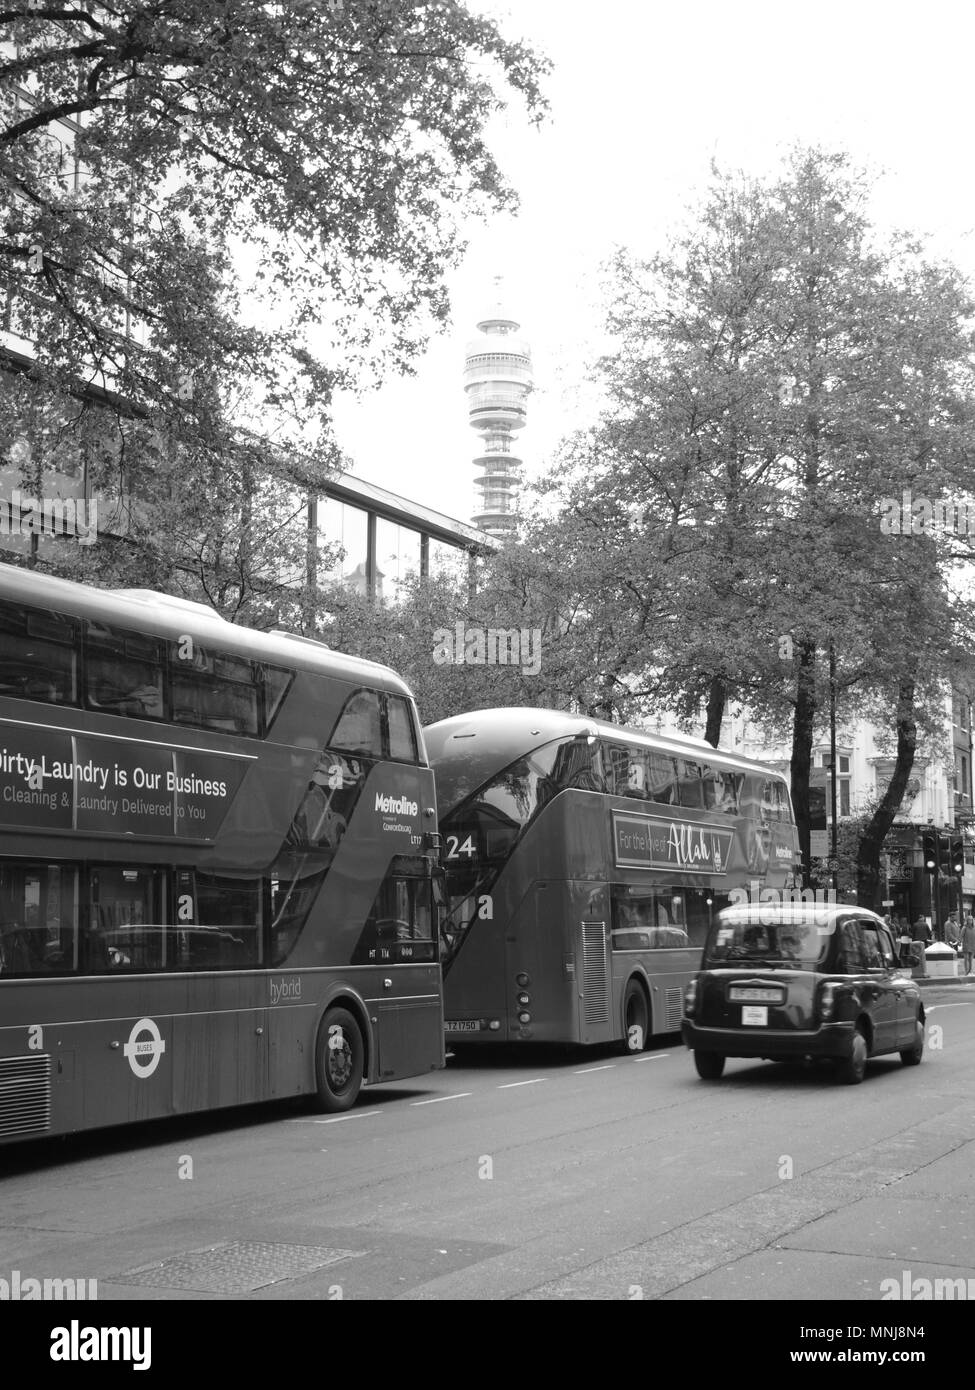 Holborn Tower London Stock Photos Holborn Tower London Stock Images Alamy